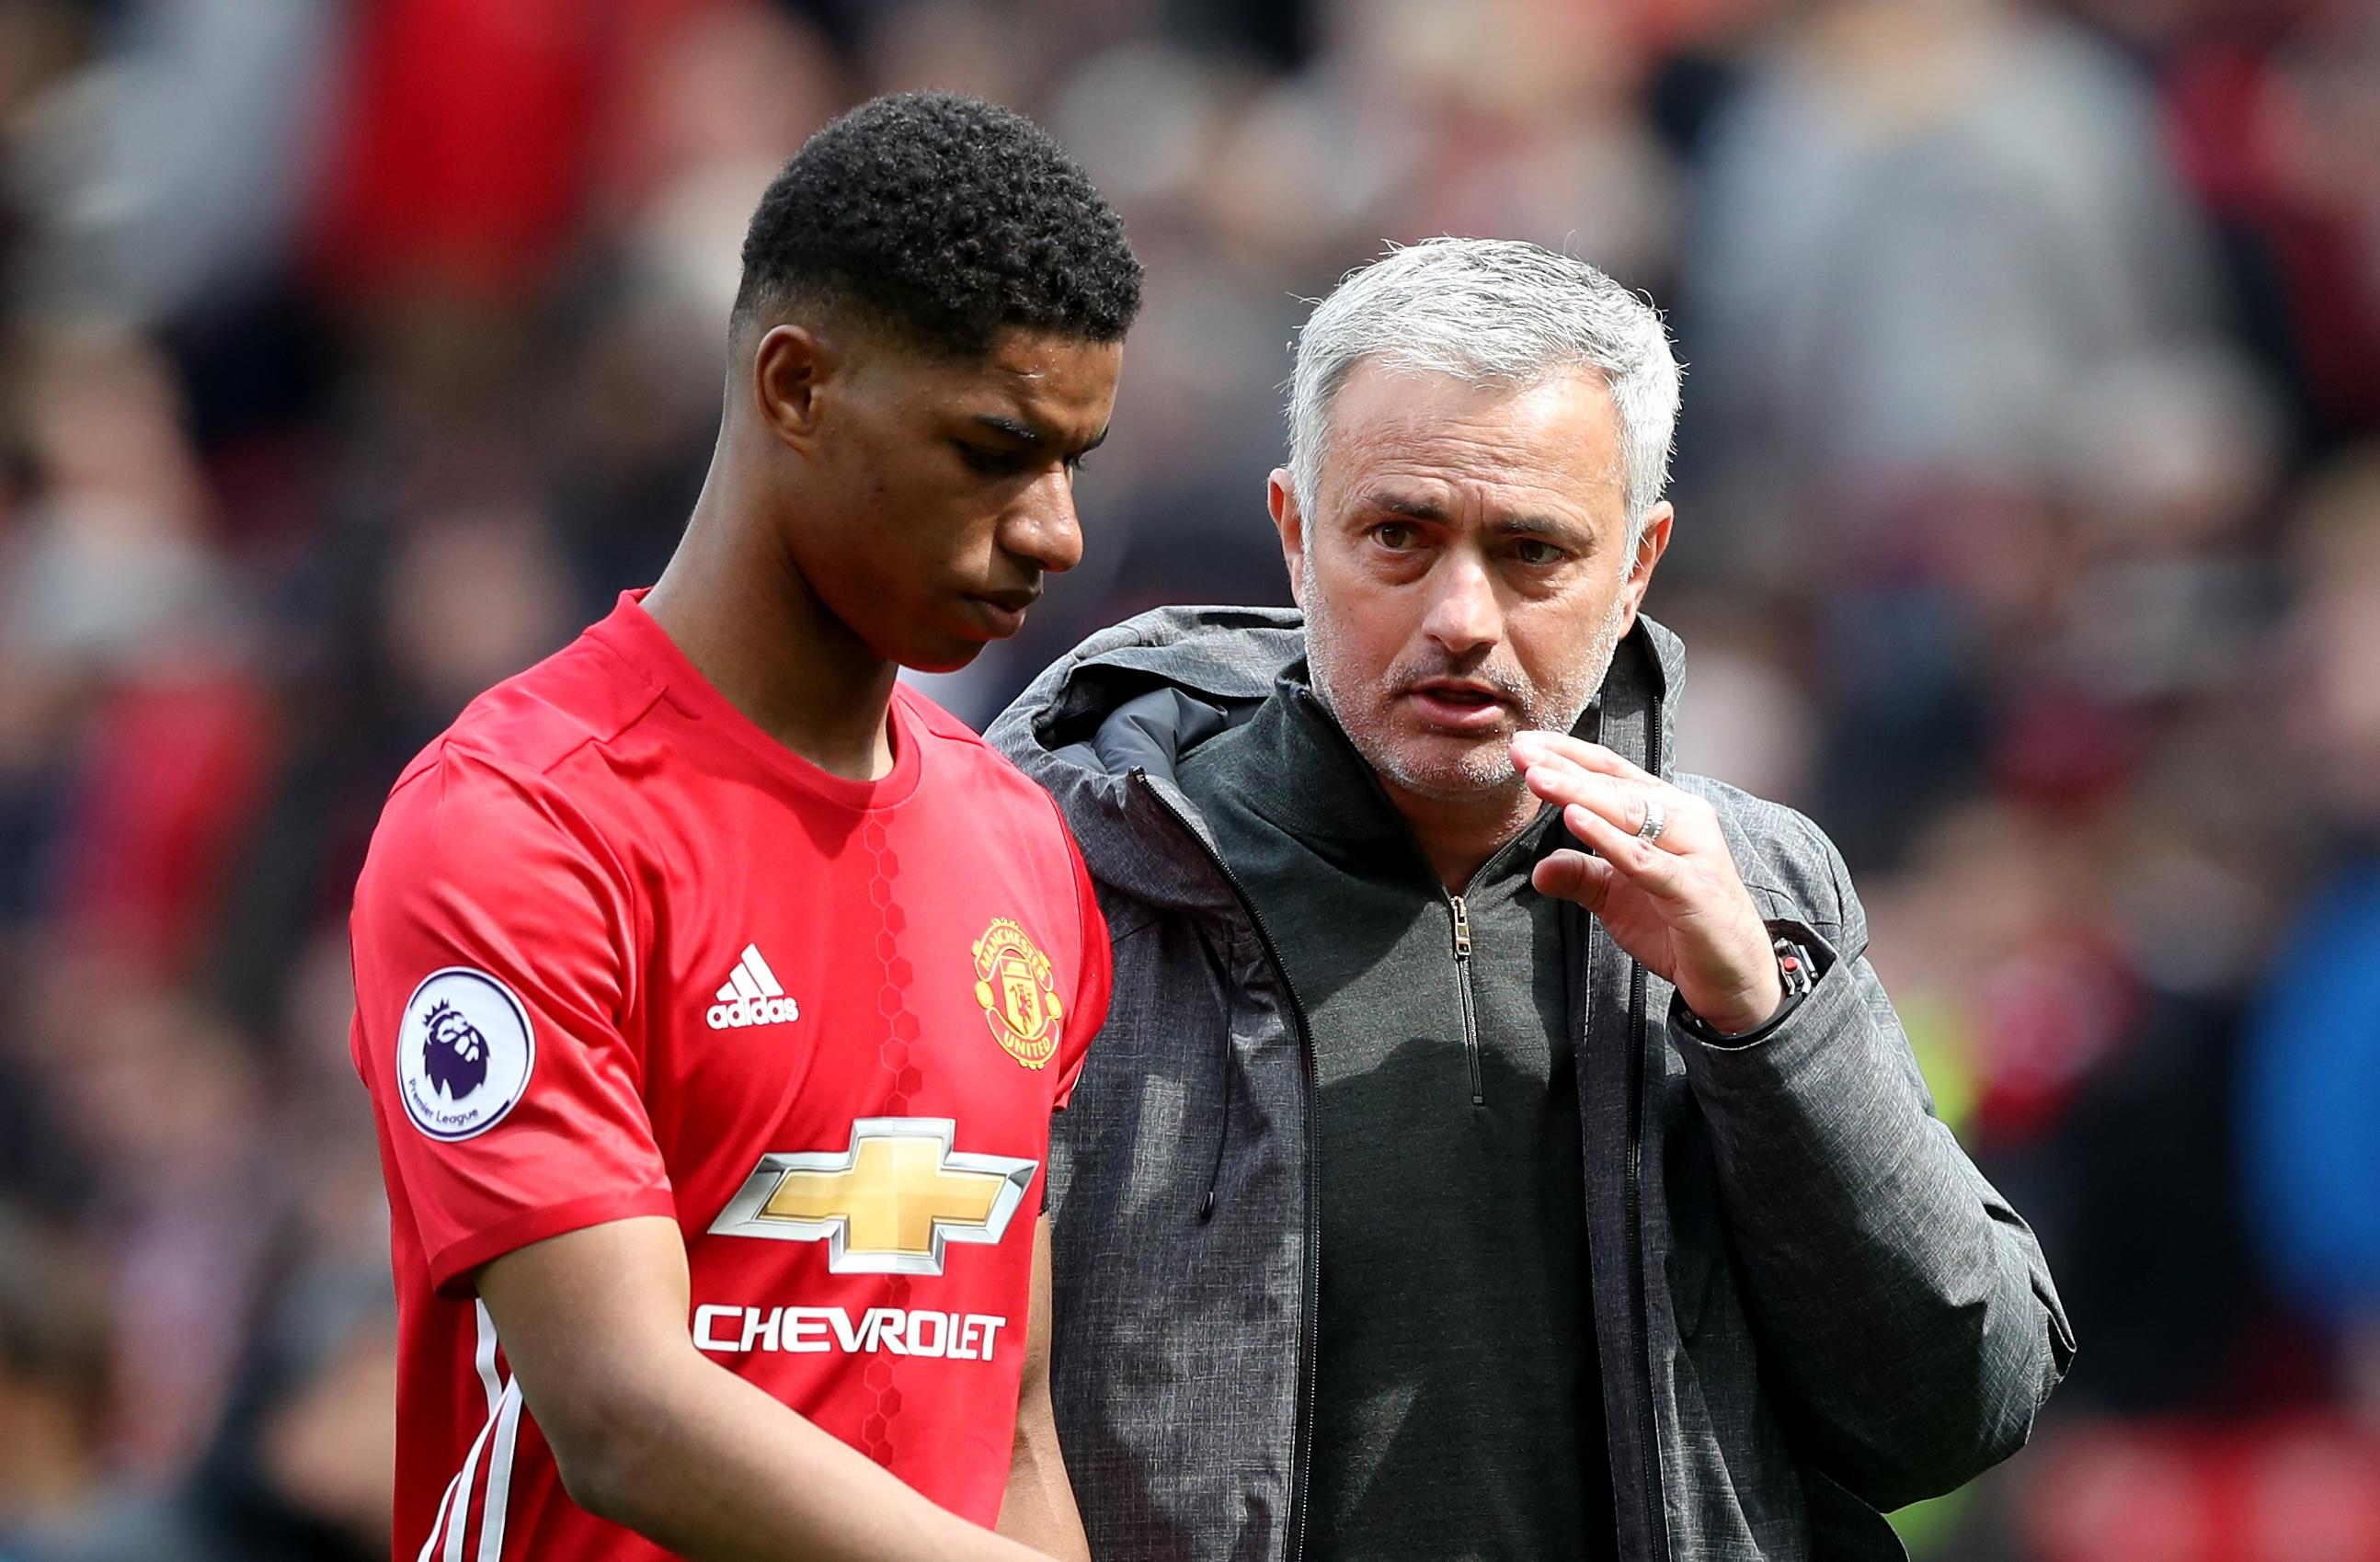 Rashford To Start Against Young Boys, Mourinho Confirms